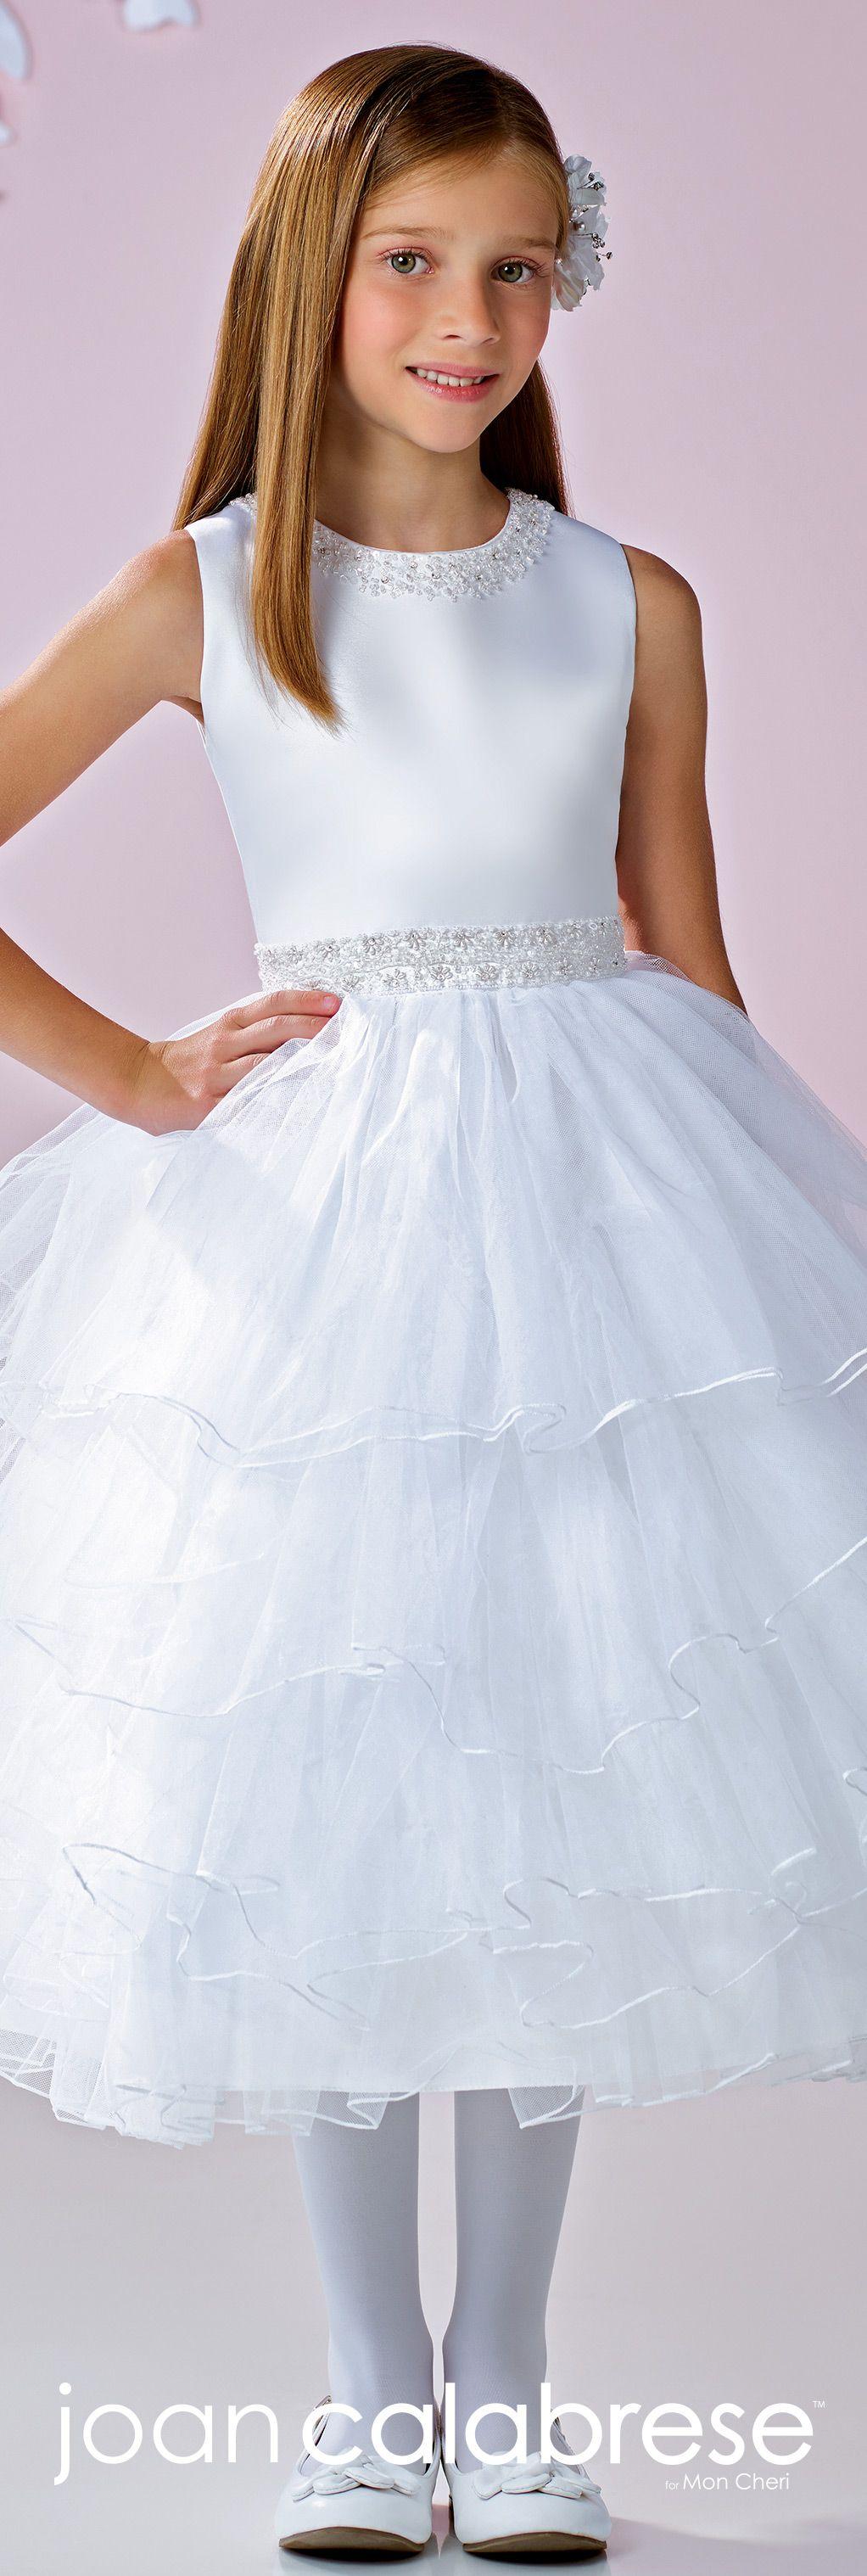 5acfc1d30a6 Multilayer Tulle Flower Girl Dresses – Fashion dresses